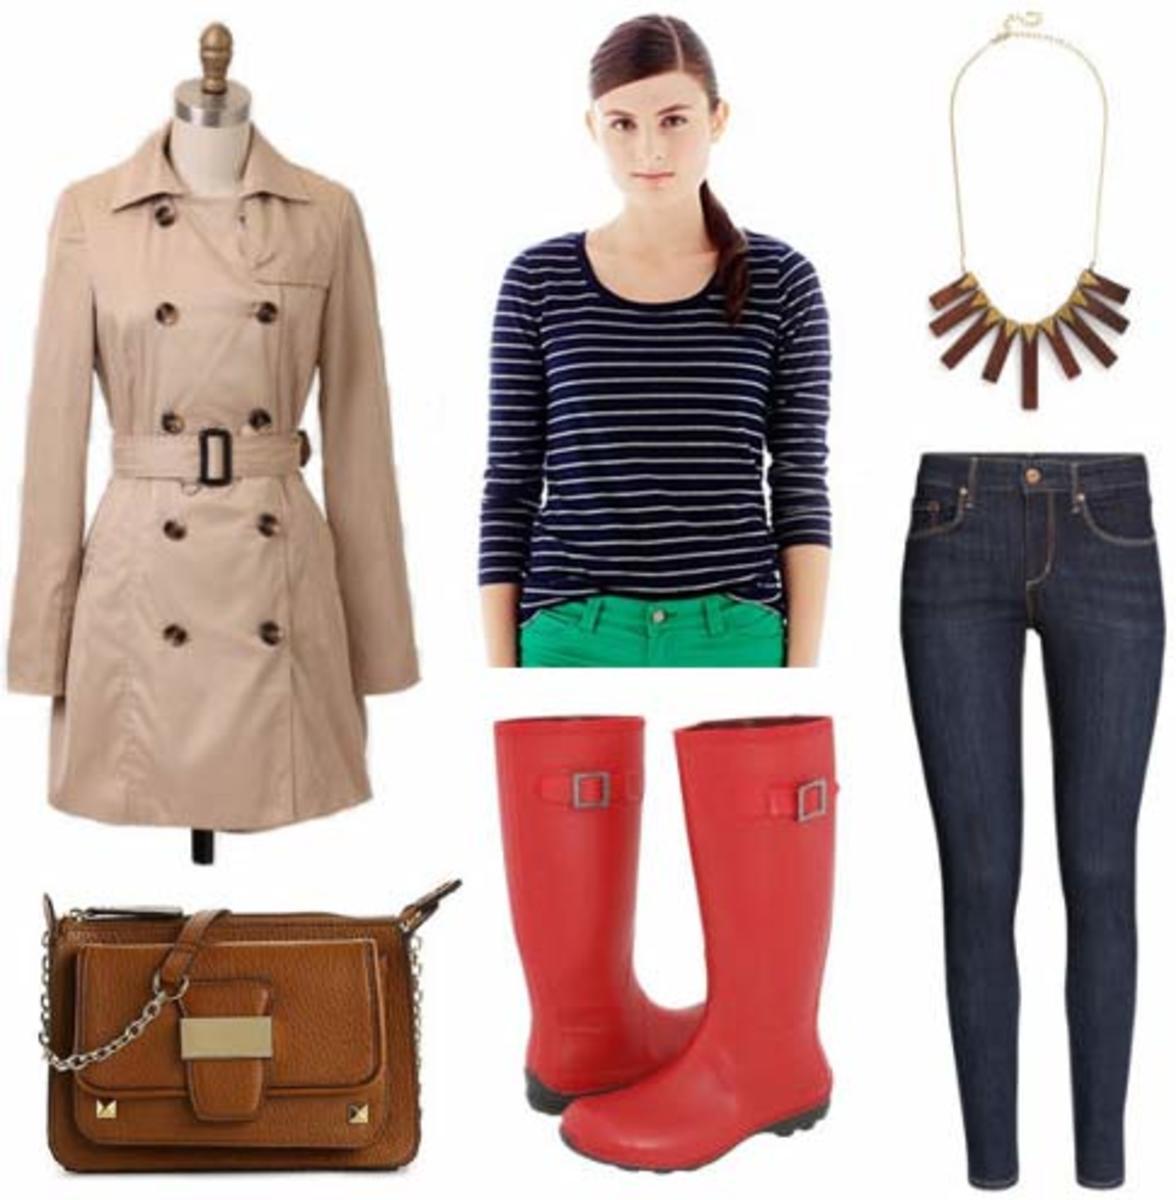 blue-navy-skinny-jeans-blue-navy-tee-stripe-bib-necklace-red-shoe-boots-rain-wellies-cognac-bag-tan-jacket-coat-trench-fall-winter-weekend.jpg